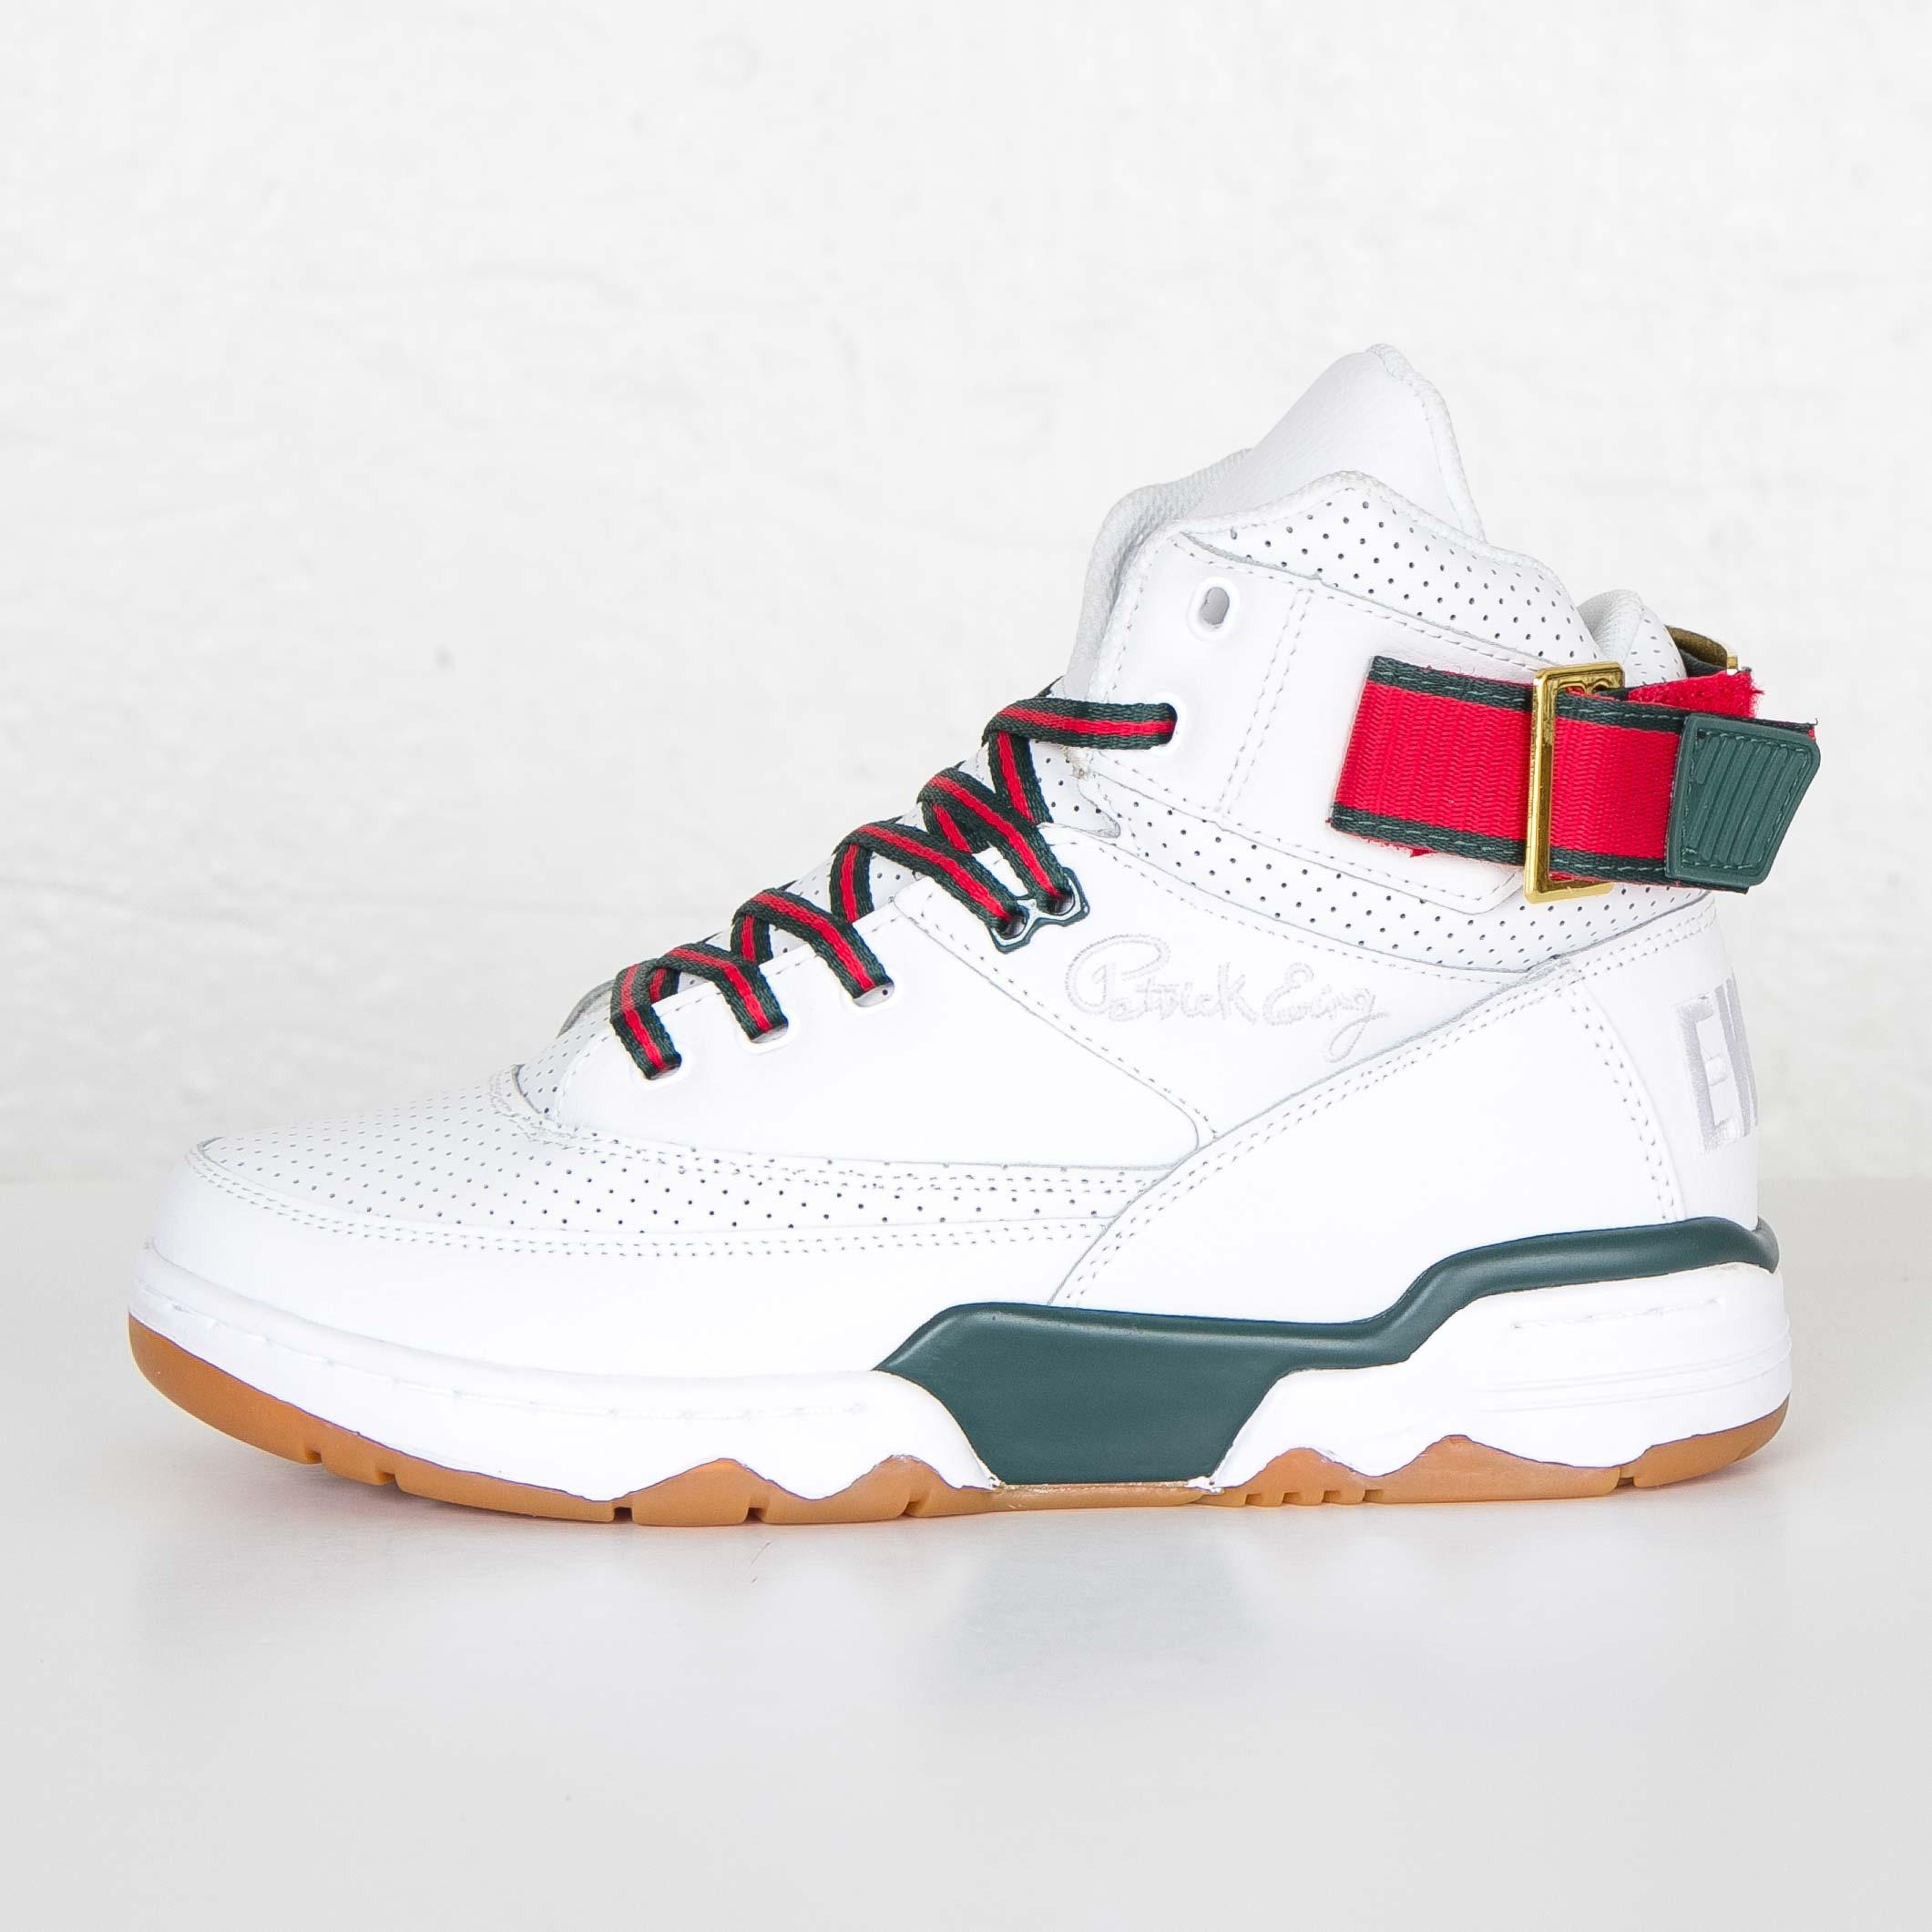 pretty nice 7c7ec f7c69 Ewing Athletics Ewing 33 Hi x Packer - 1ew90172-124 - Sneakersnstuff    sneakers   streetwear online since 1999